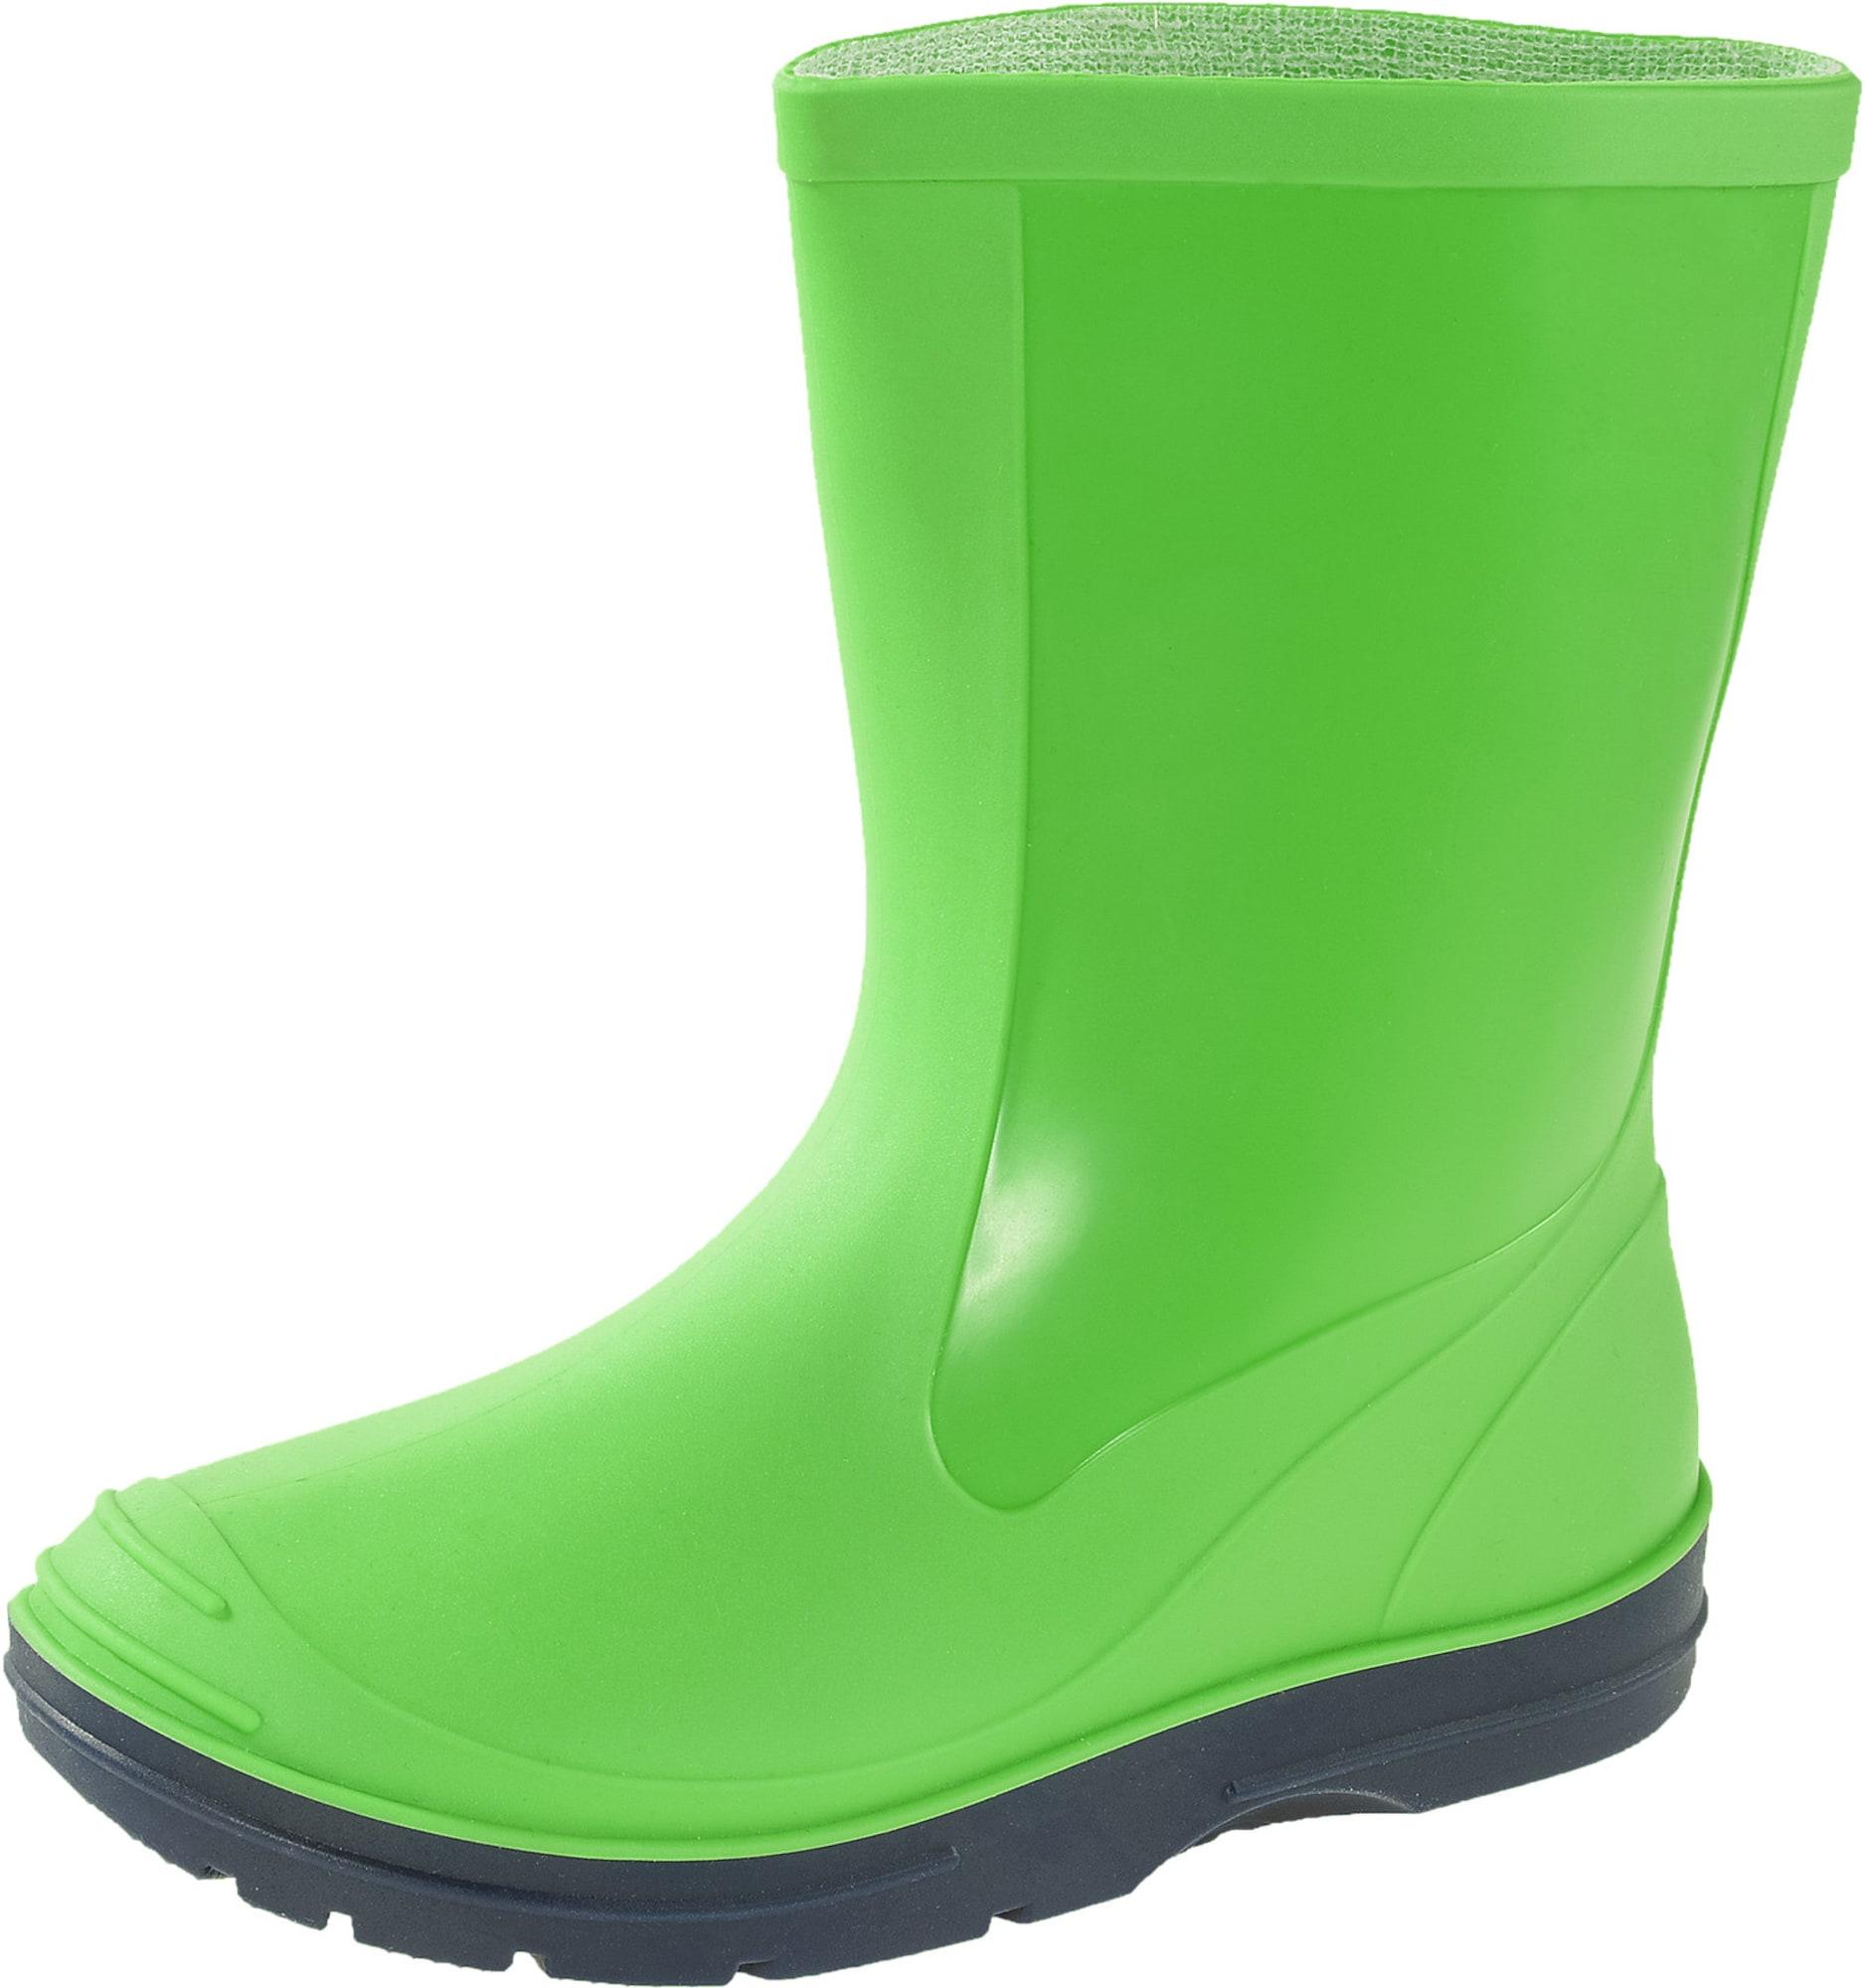 BECK Guminiai batai žalia